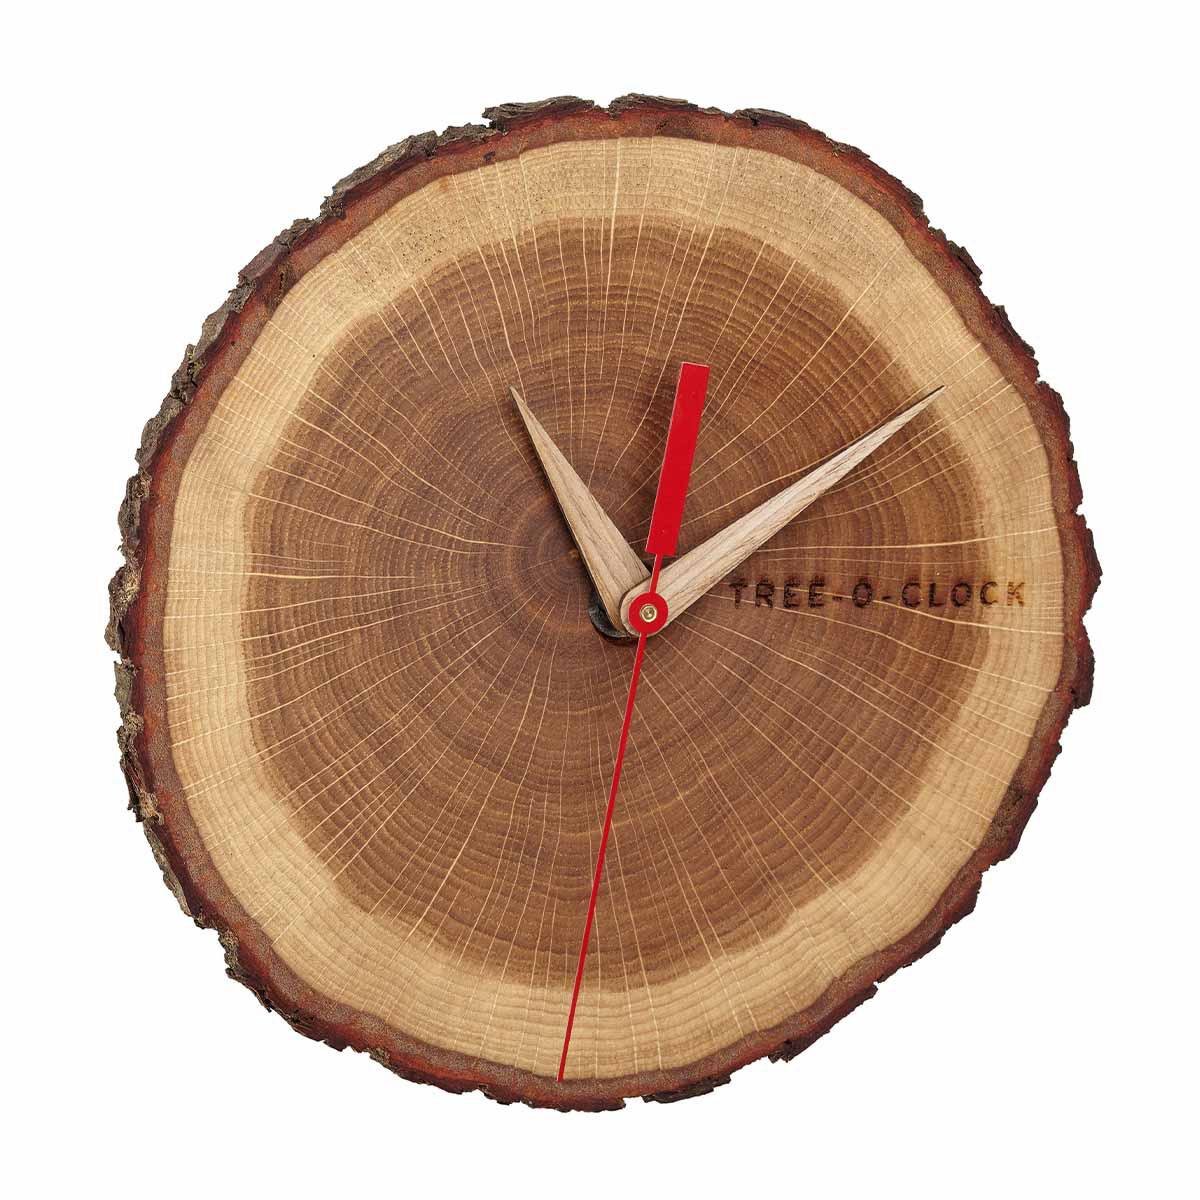 60-3046-08-analoge-wanduhr-eichenholz-tree-o-clock-1200x1200px.jpg